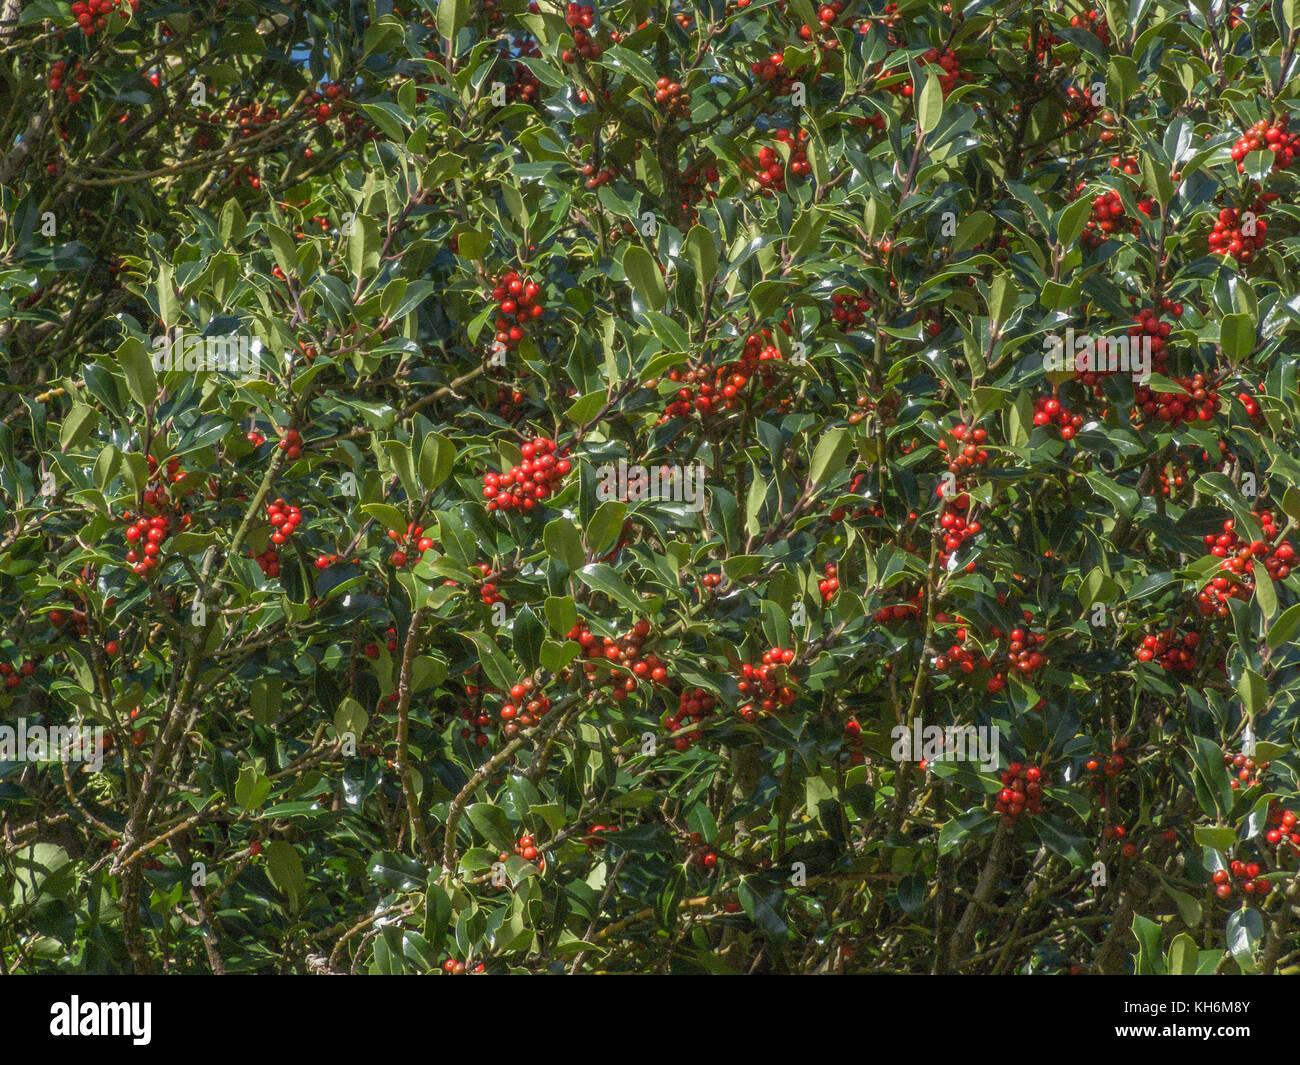 Red berries on Holly (Ilex aquifolium) bush. - Stock Image